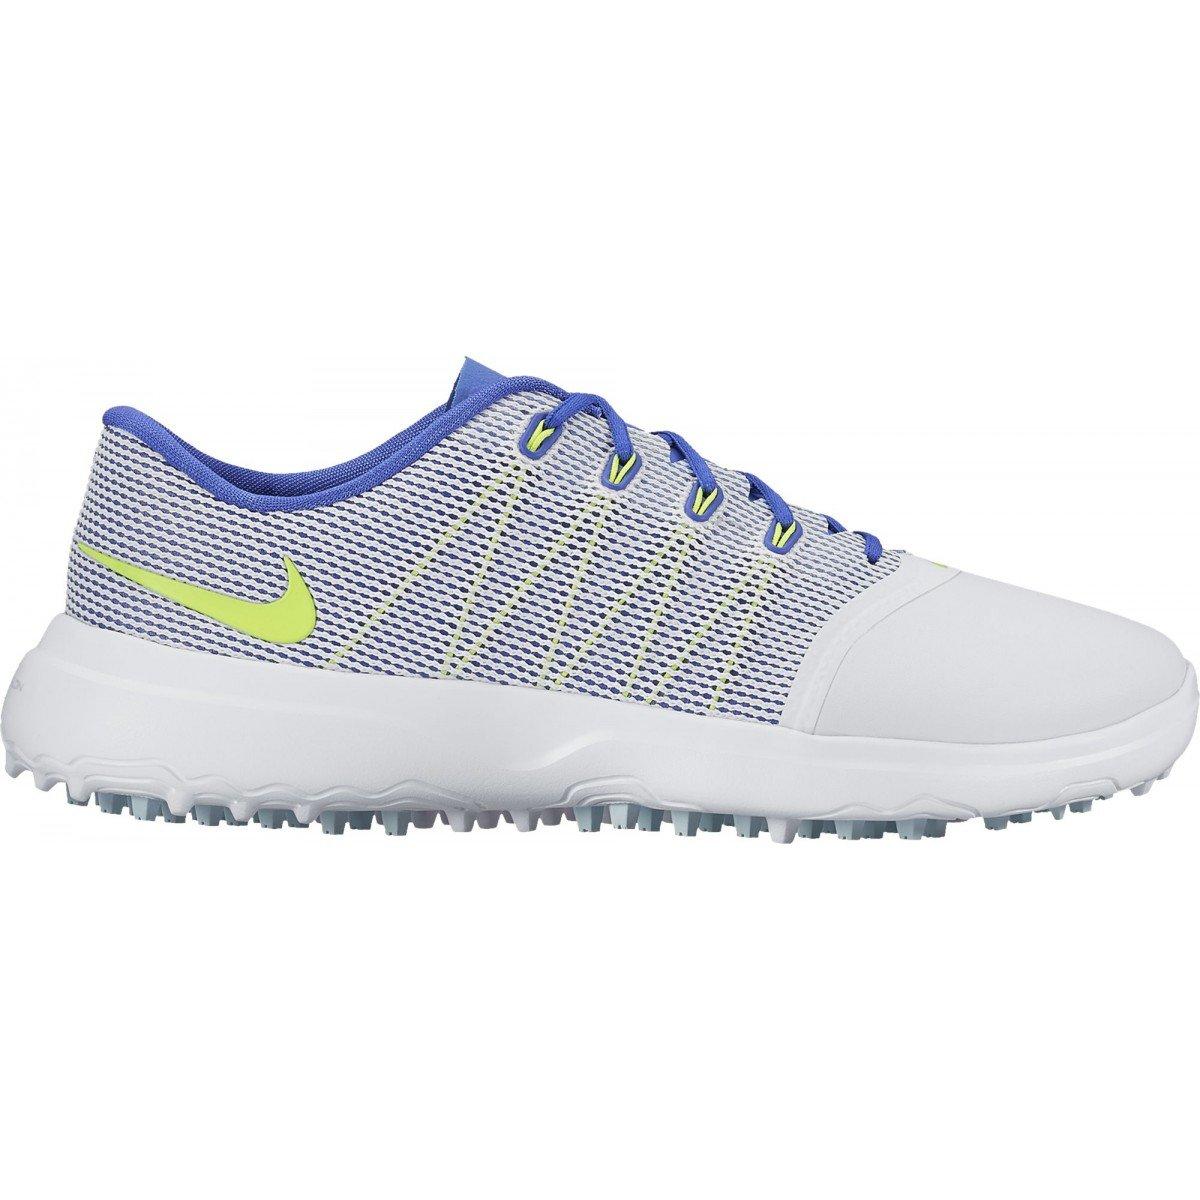 NIKE Golf Womens Lunar Empress 2 Shoes (6.5 B(M) US, Glacier Blue/Volt)